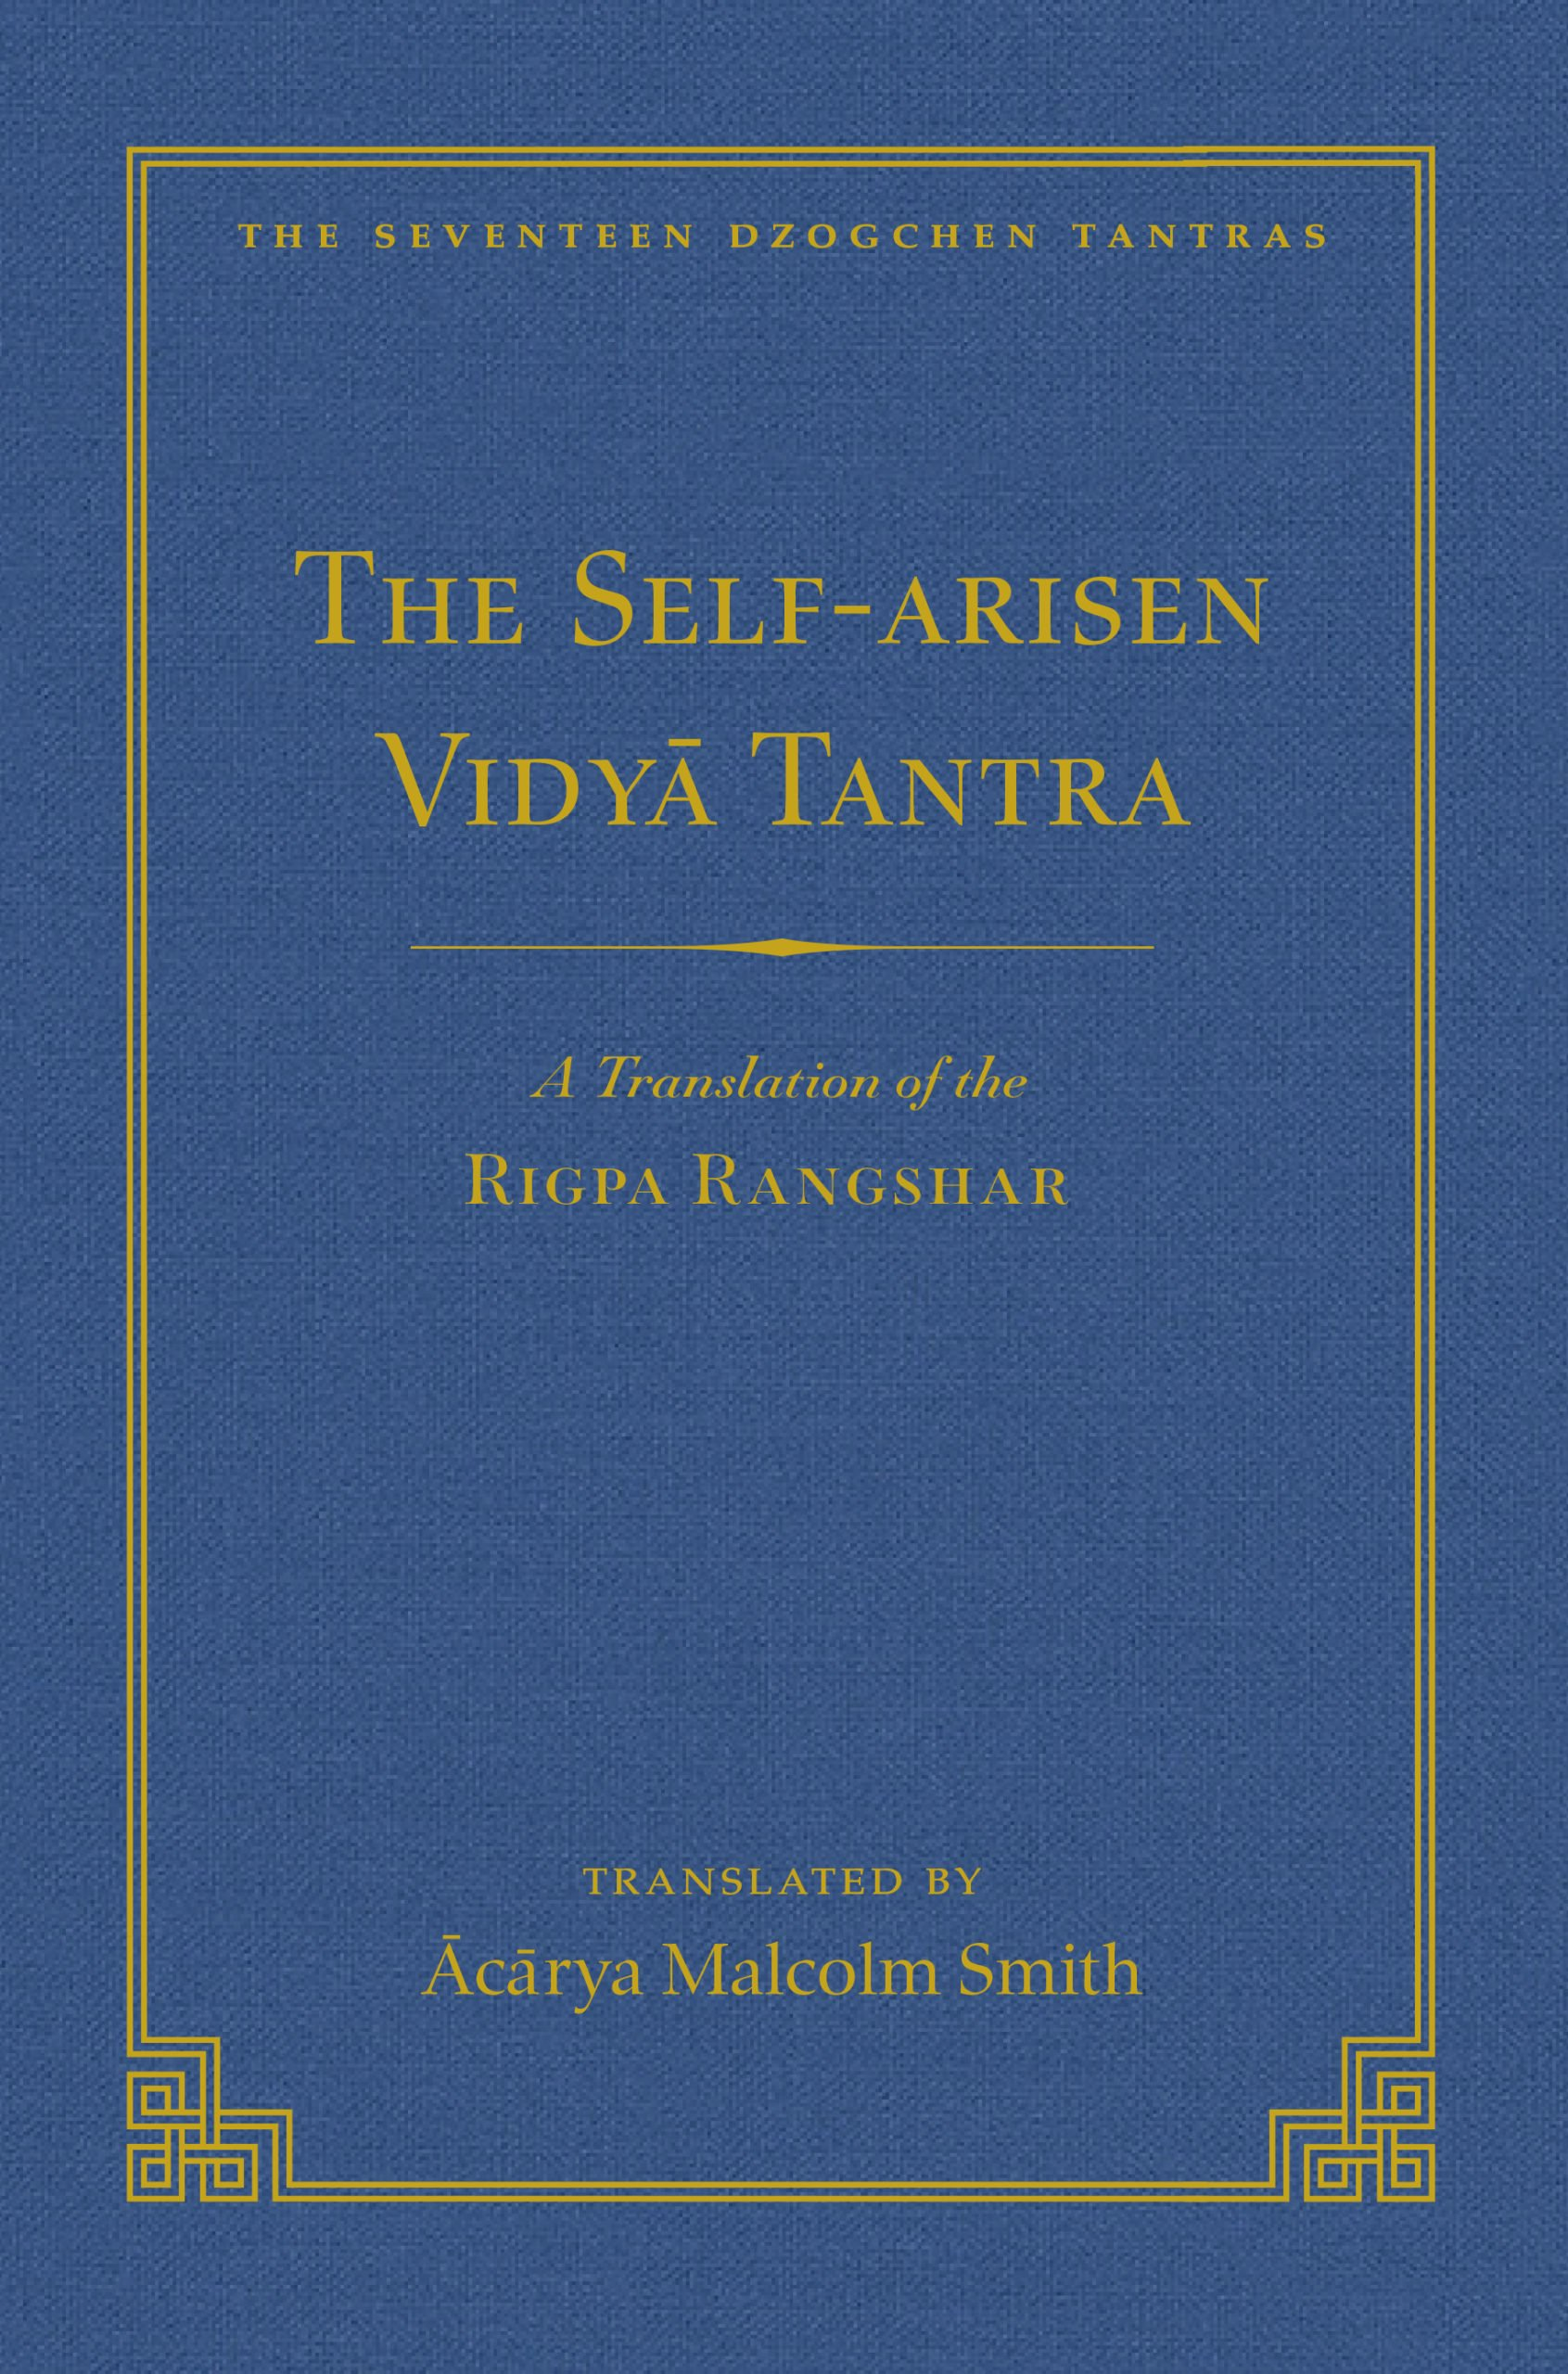 Self-Arisen Vidya Tantra cover art